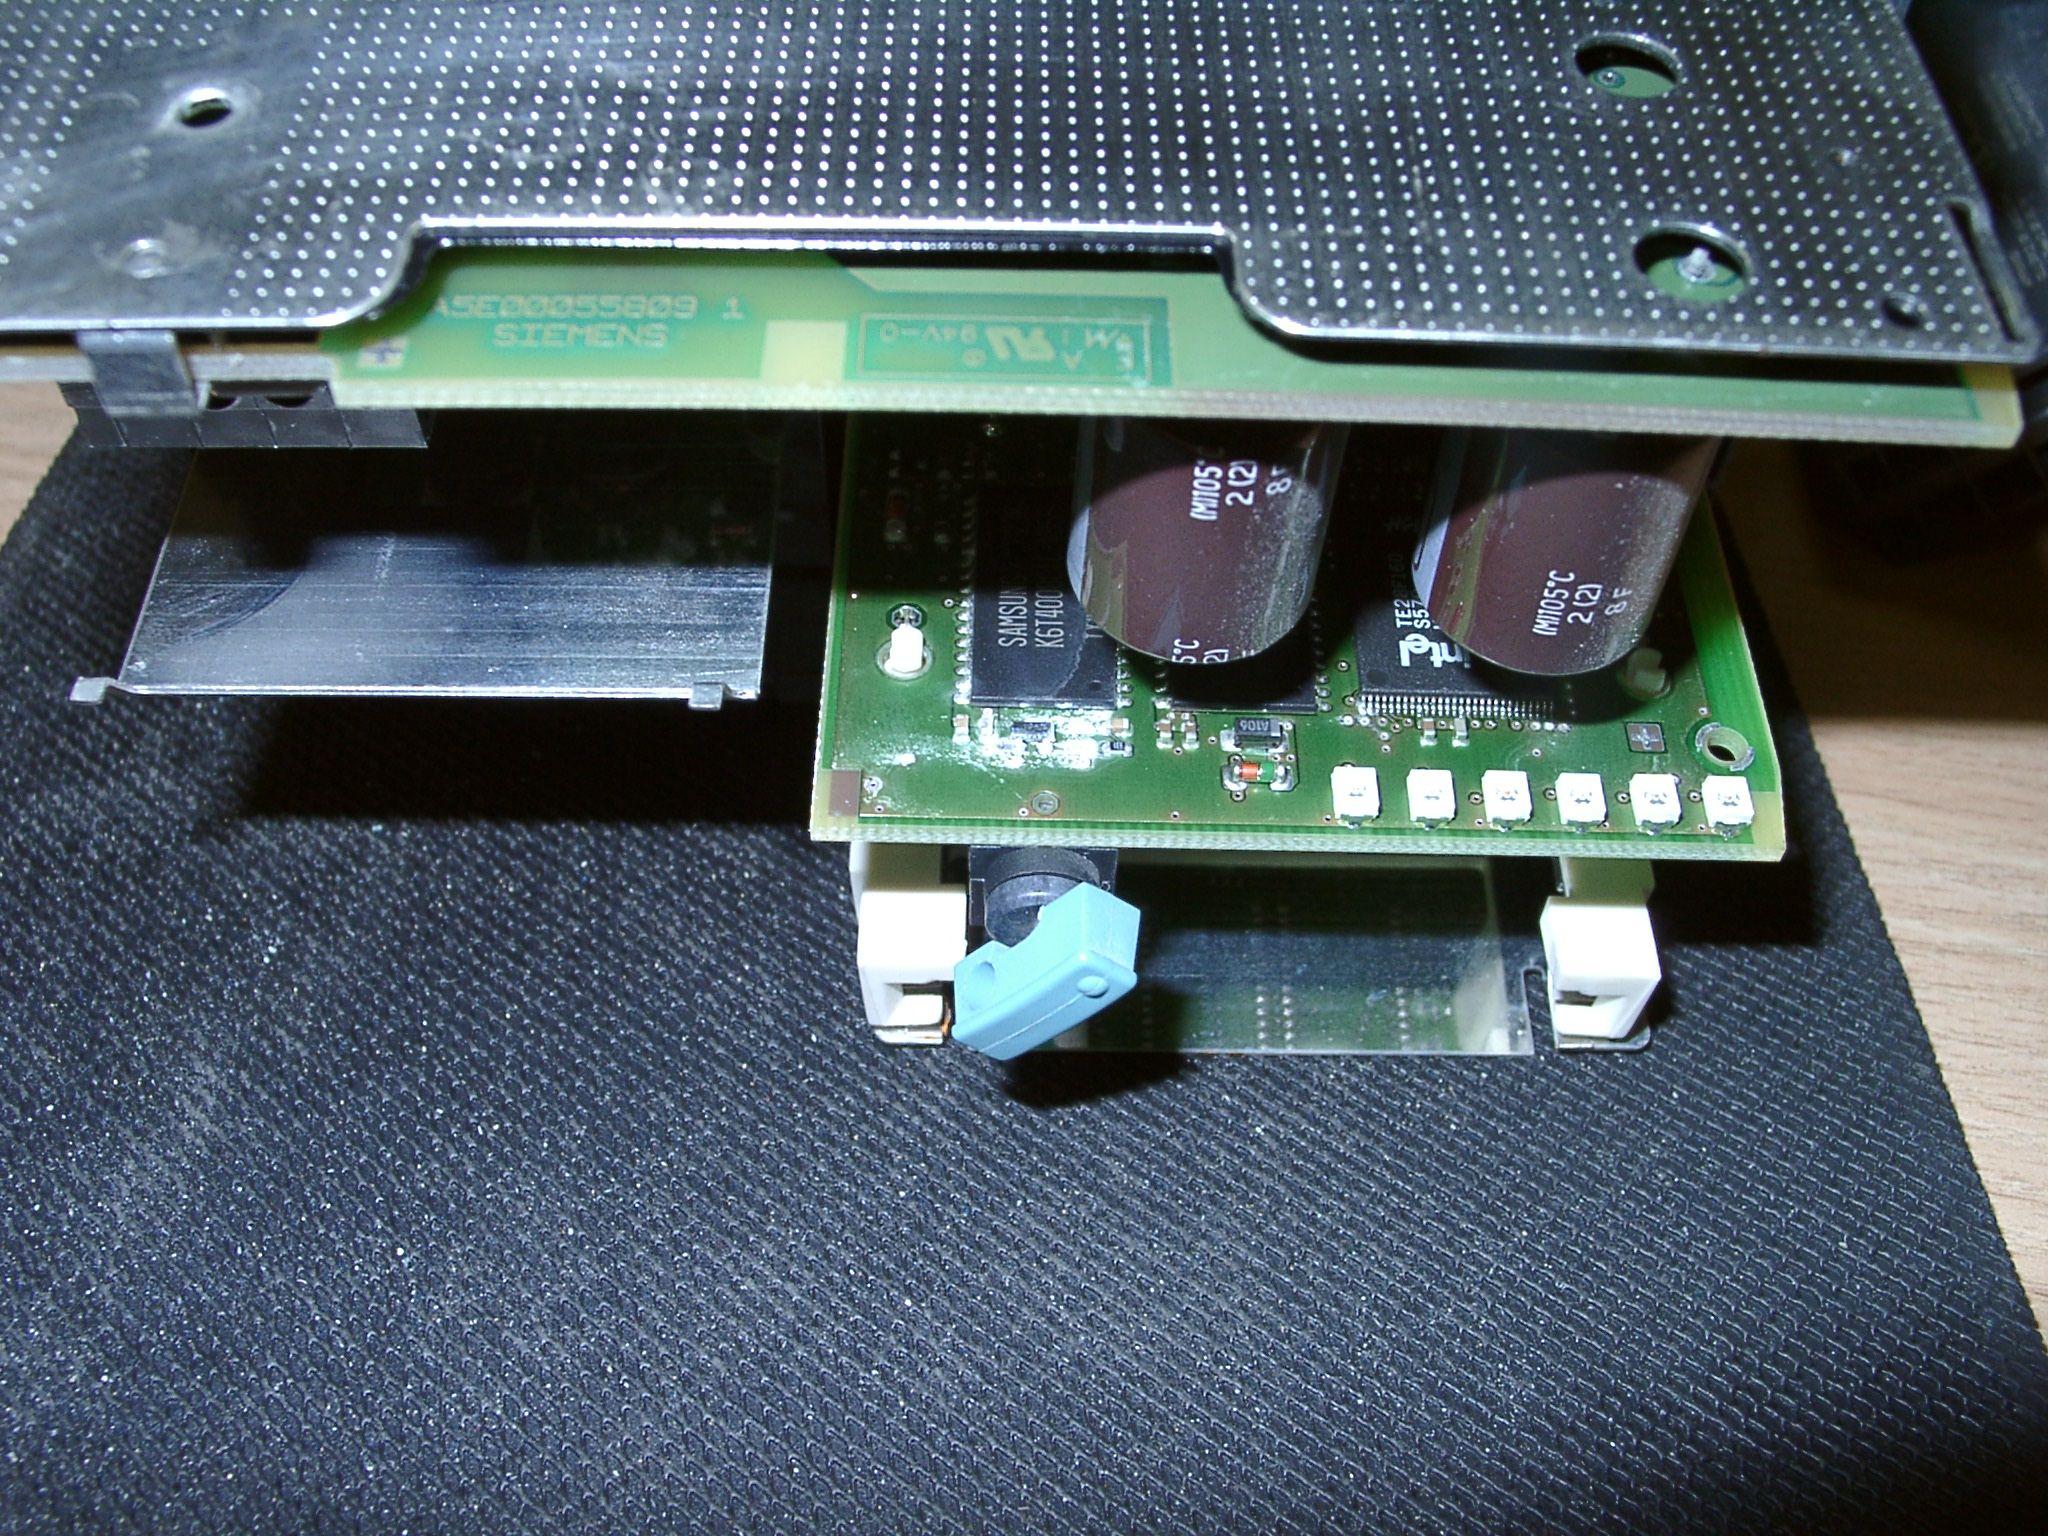 Светофильтр нд32 для бпла спарк защита подвеса синяя mavic прозрачная, пластиковая